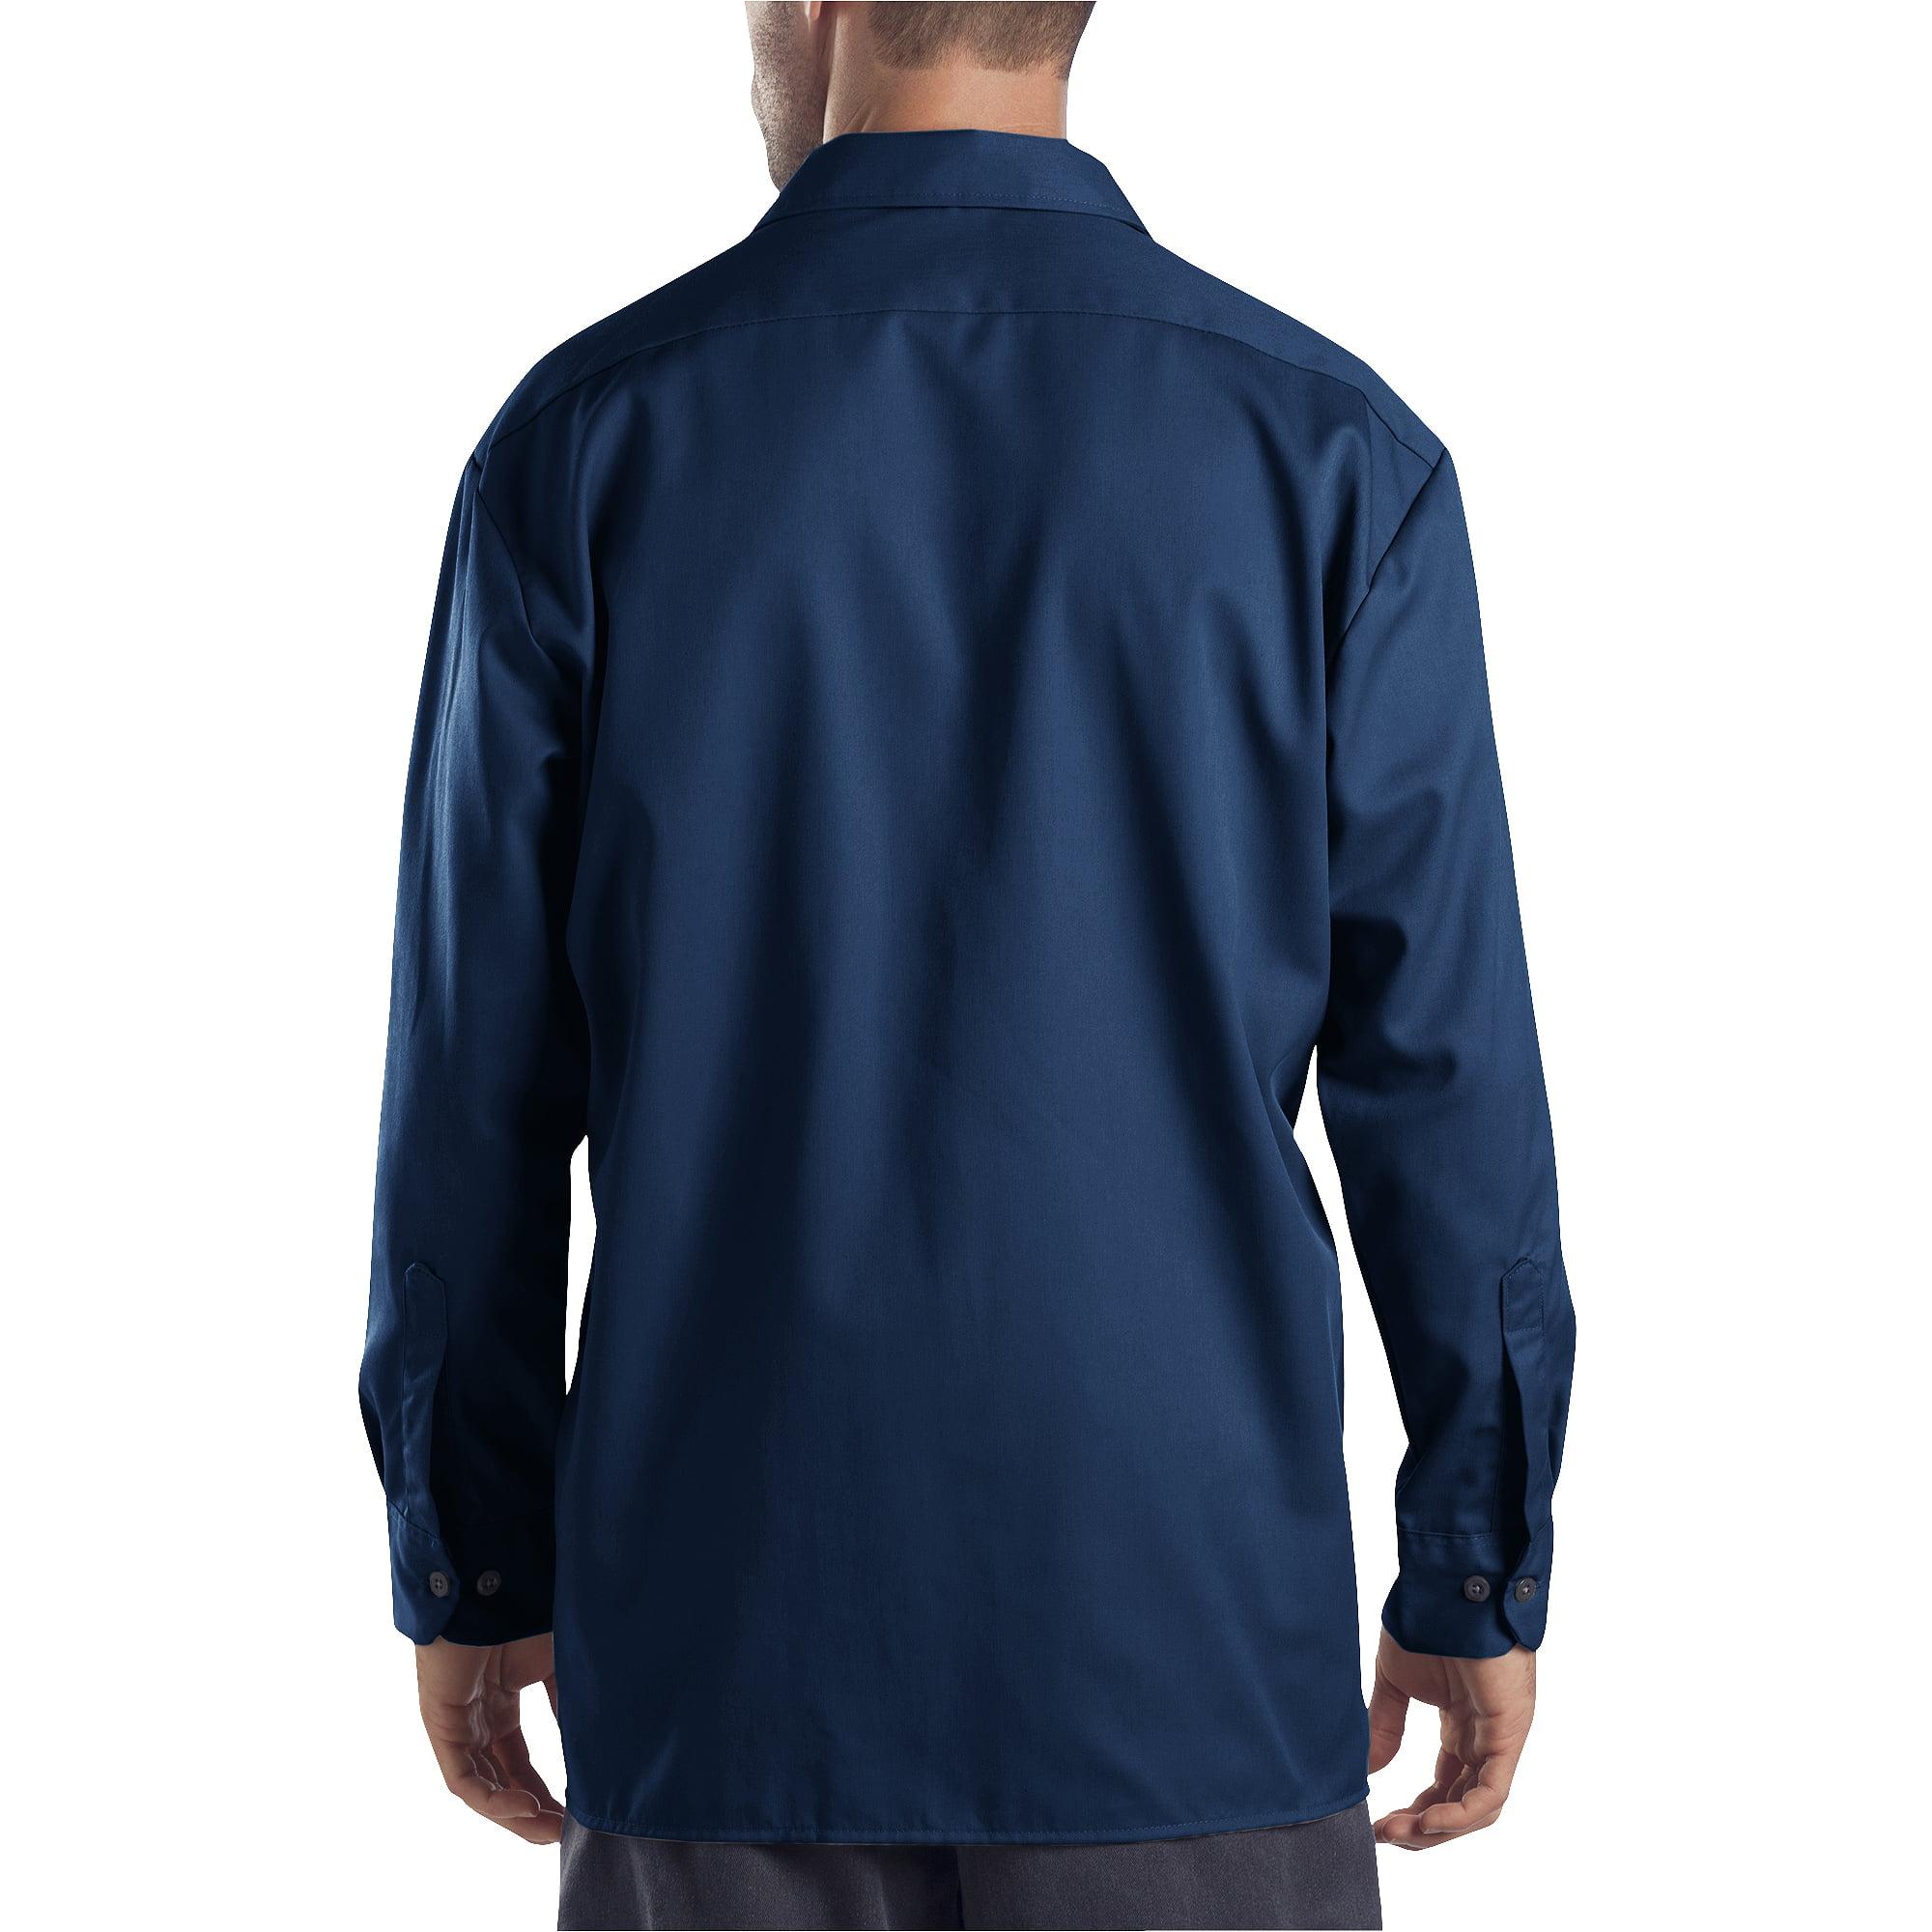 Dickies Men's Original Fit Long Sleeve Twill Work Shirt - Walmart.com